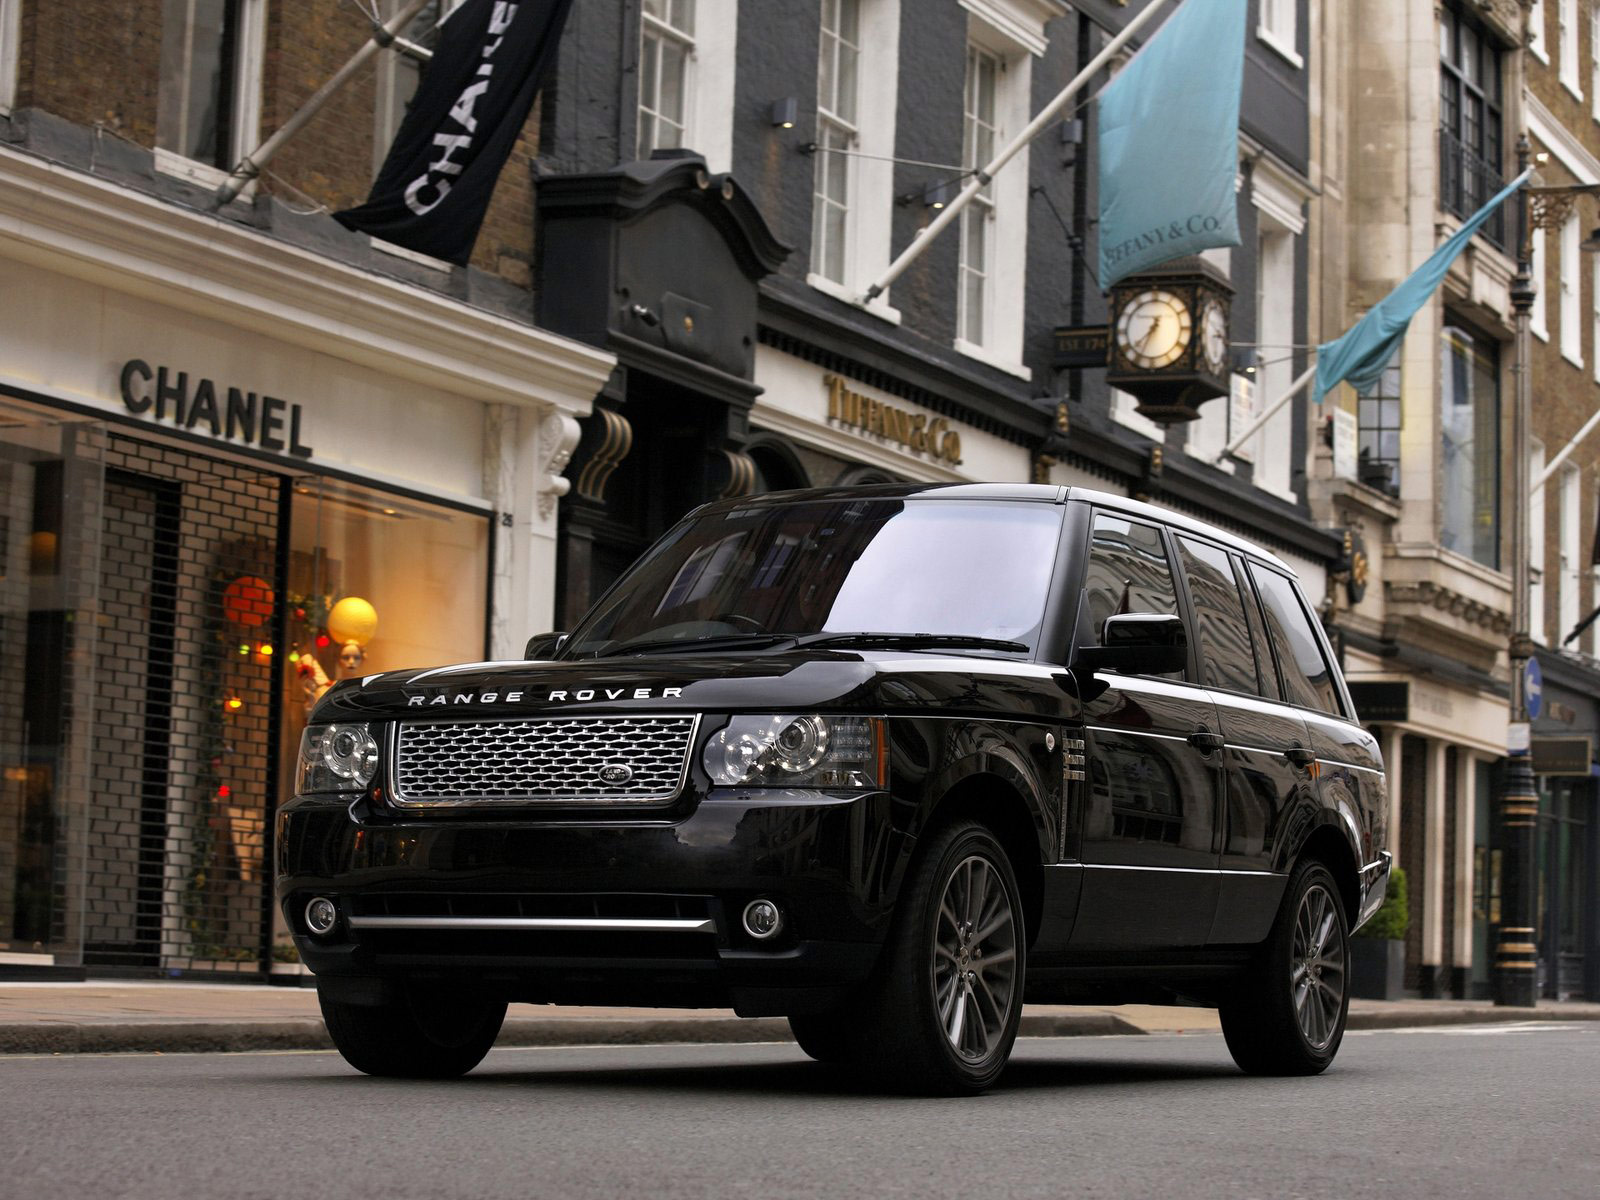 http://3.bp.blogspot.com/-bI1qlqYOTSE/TqC9Q_jvwwI/AAAAAAAAD3I/C2NMg1XoRPk/s1600/2011-Land-Rover-Range-Rover-Autobiography_Black_car-pictures-download_2.jpg